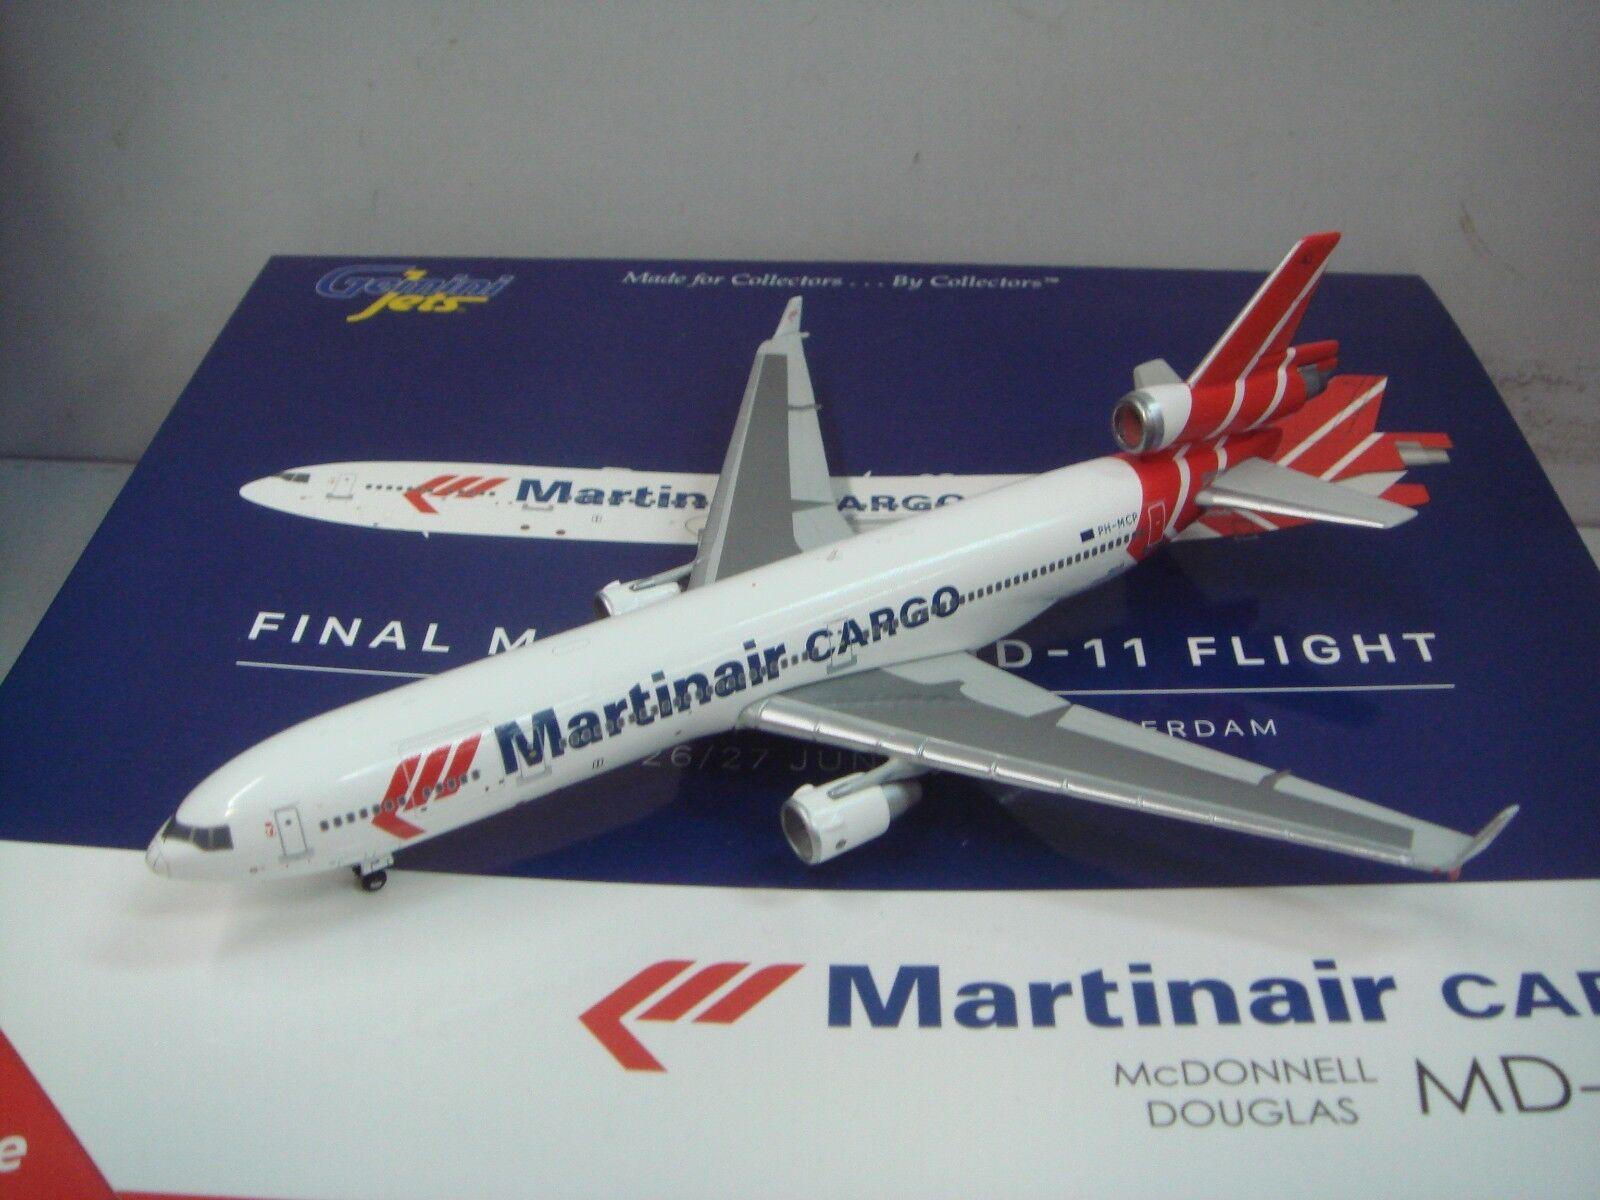 Gemini Jets 400 Martinair voiturego MD-11F   2005s Couleur - Farewell MD-11  1 400  Stade Cadeaux